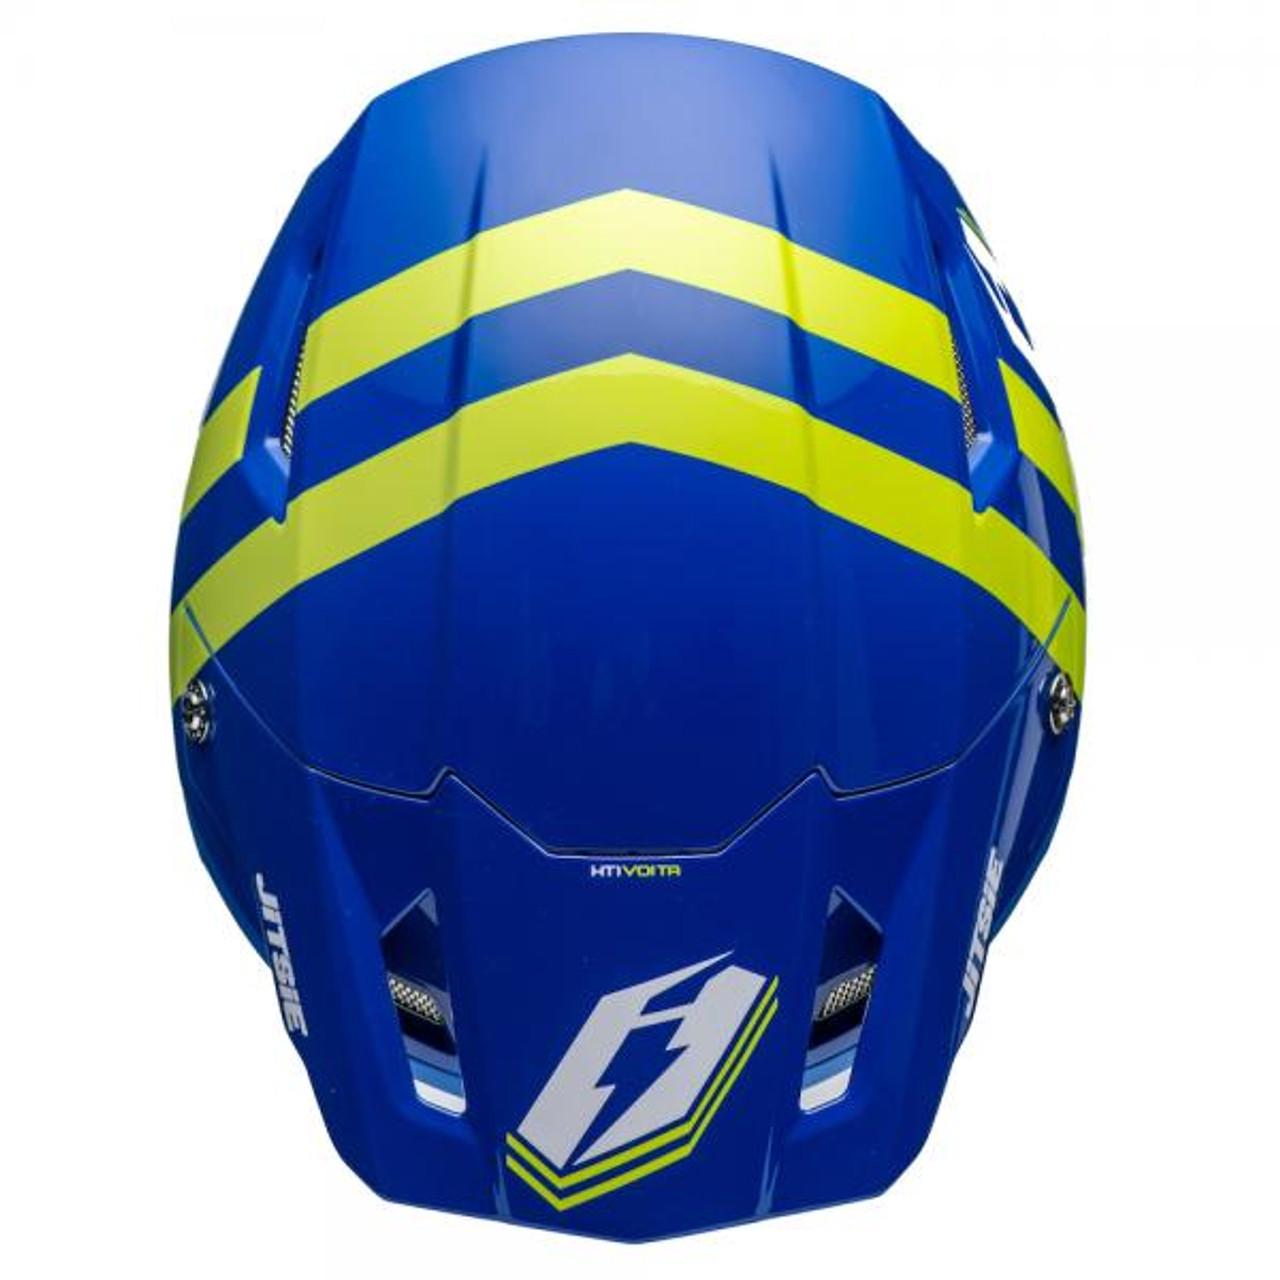 Helmet HT1 Voita, blue/ fluo yellow